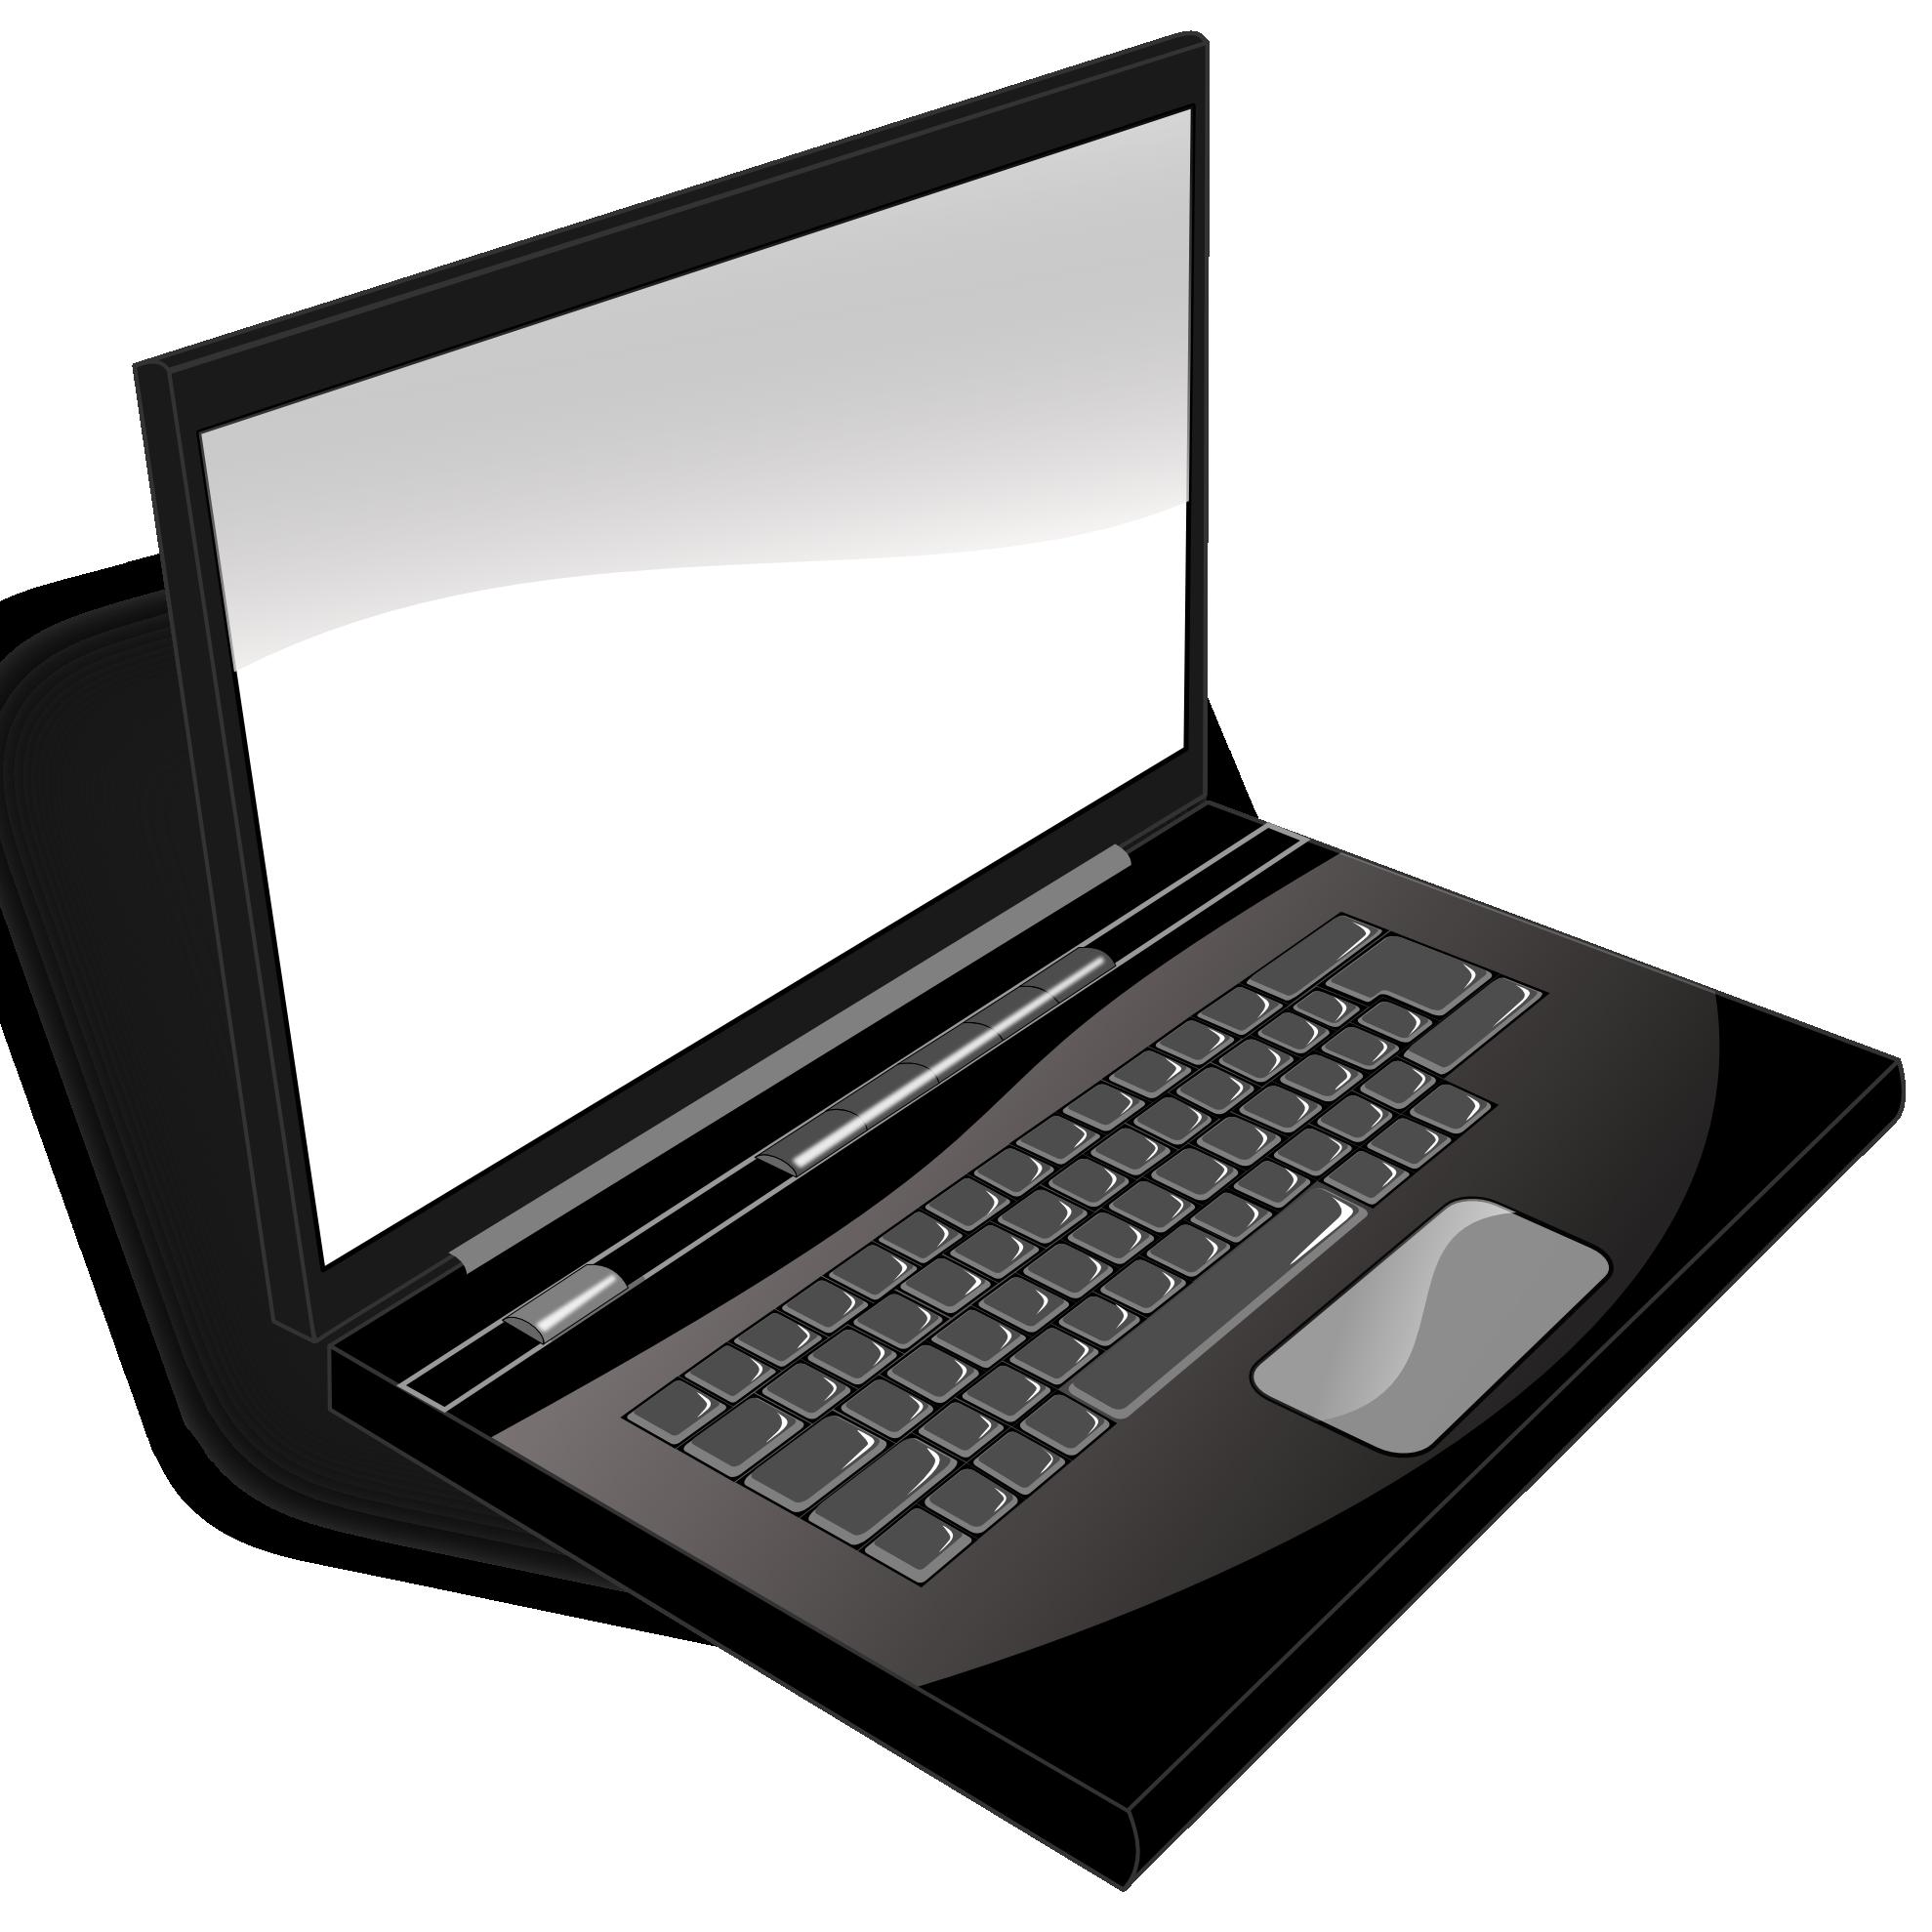 Computer vs laptop clipart jpg free download Computer vs laptop clipart - ClipartFest jpg free download